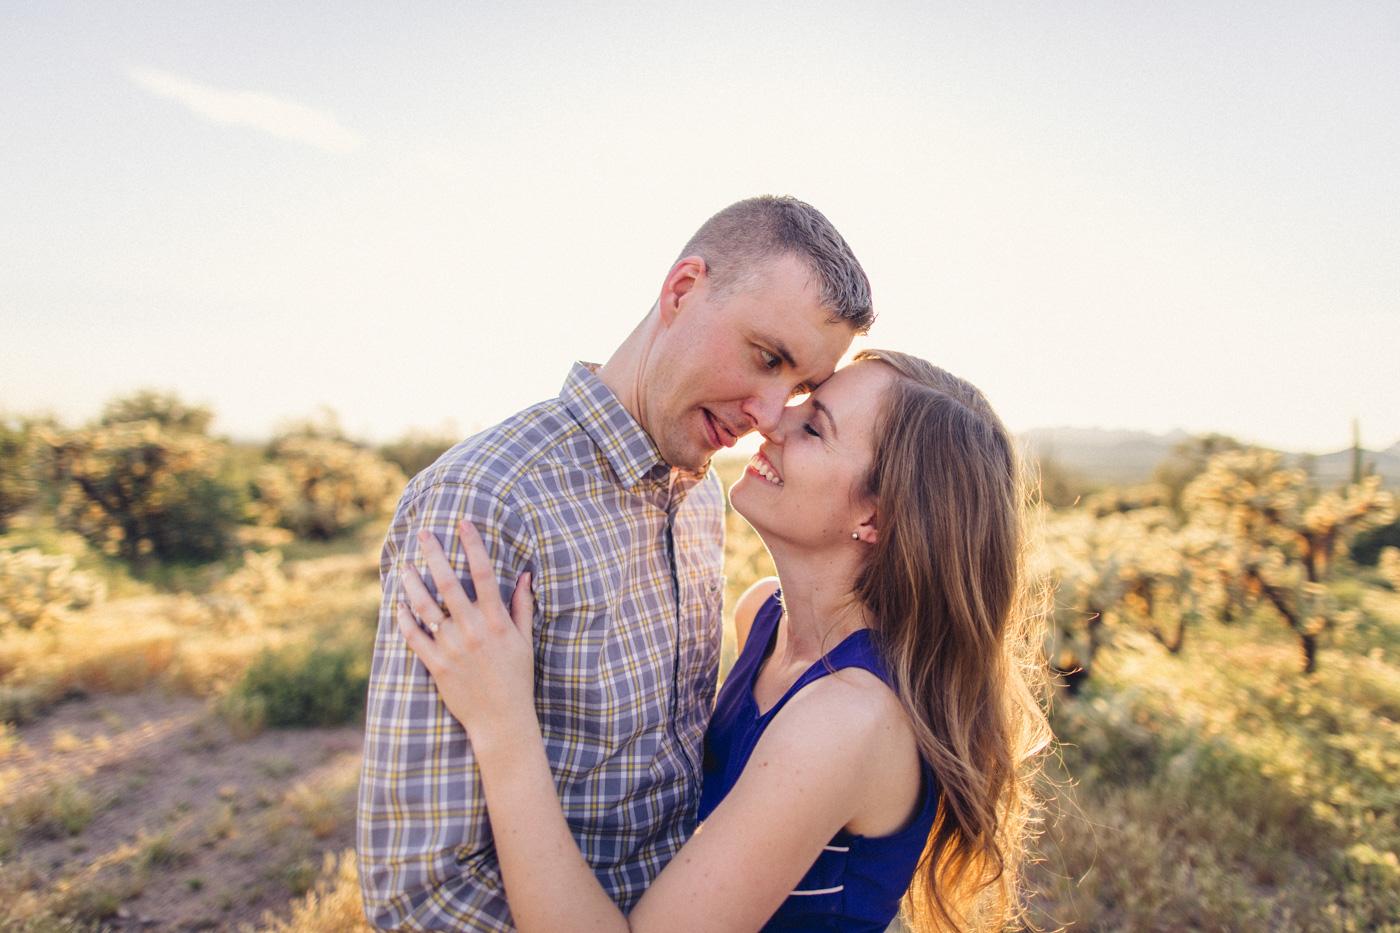 goofy-fun-engagement-photo